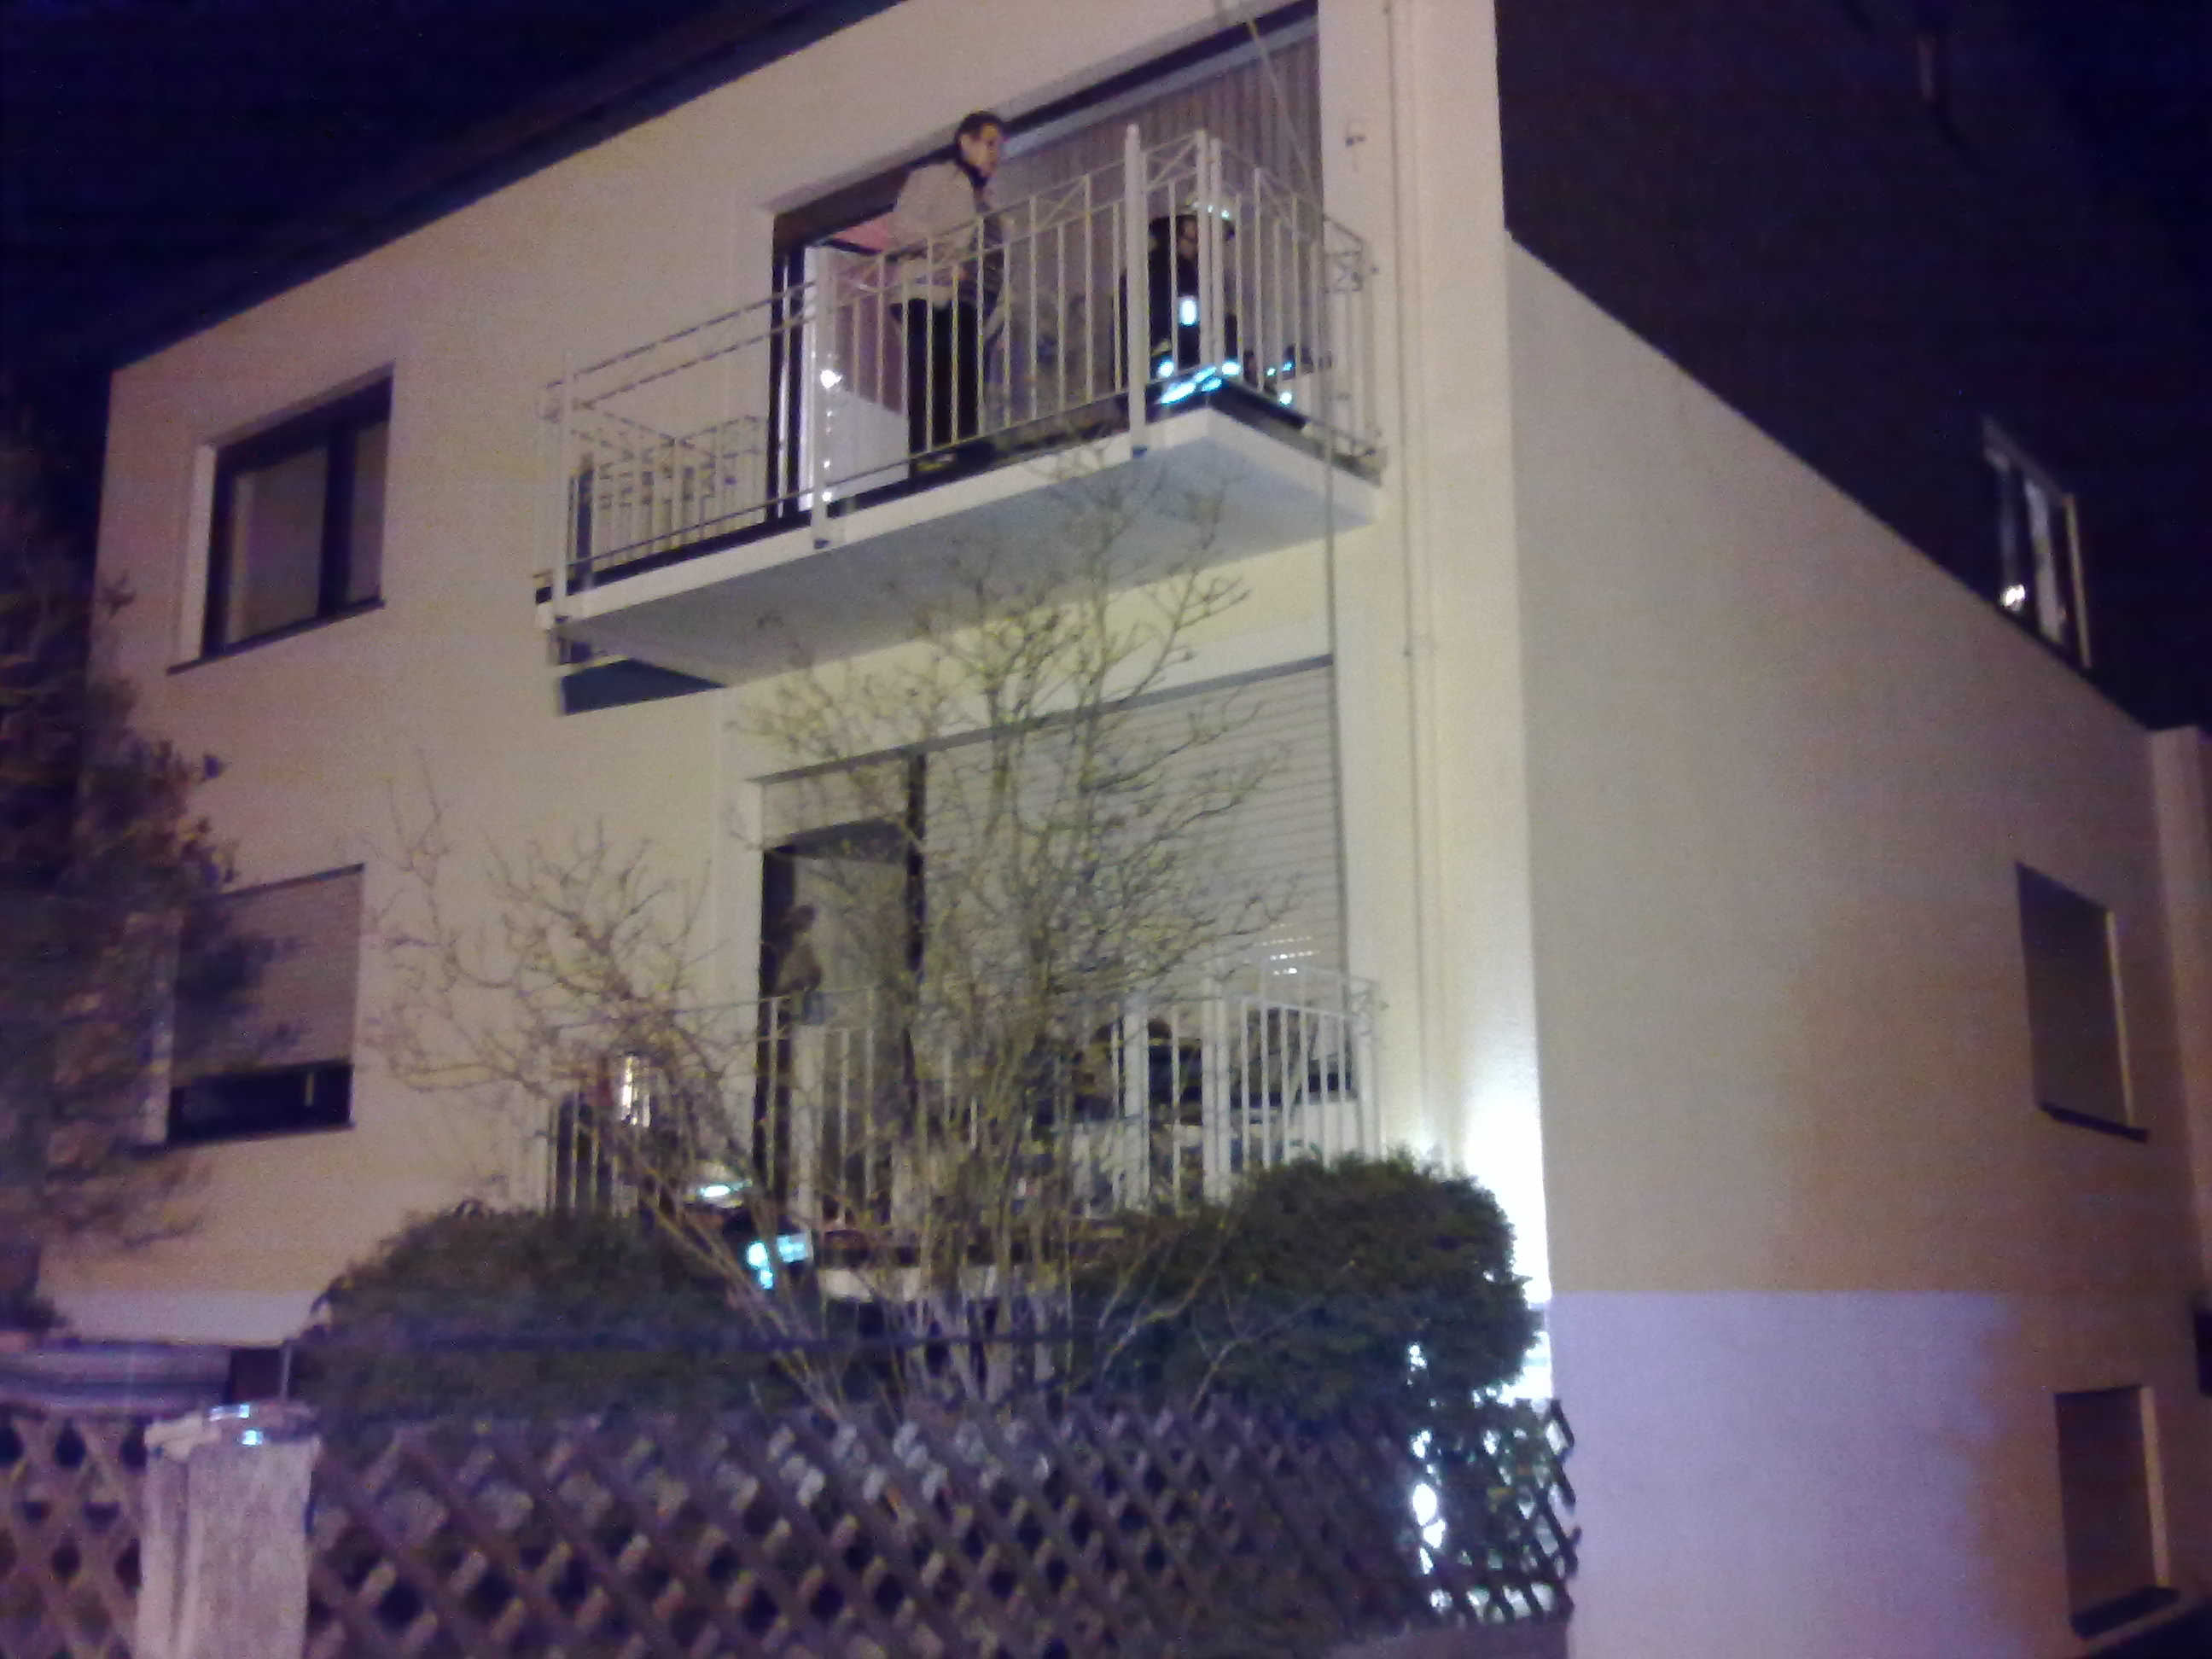 h1 abgerissene stra enbeleuchtung freiwillige feuerwehr simmern westerwald. Black Bedroom Furniture Sets. Home Design Ideas